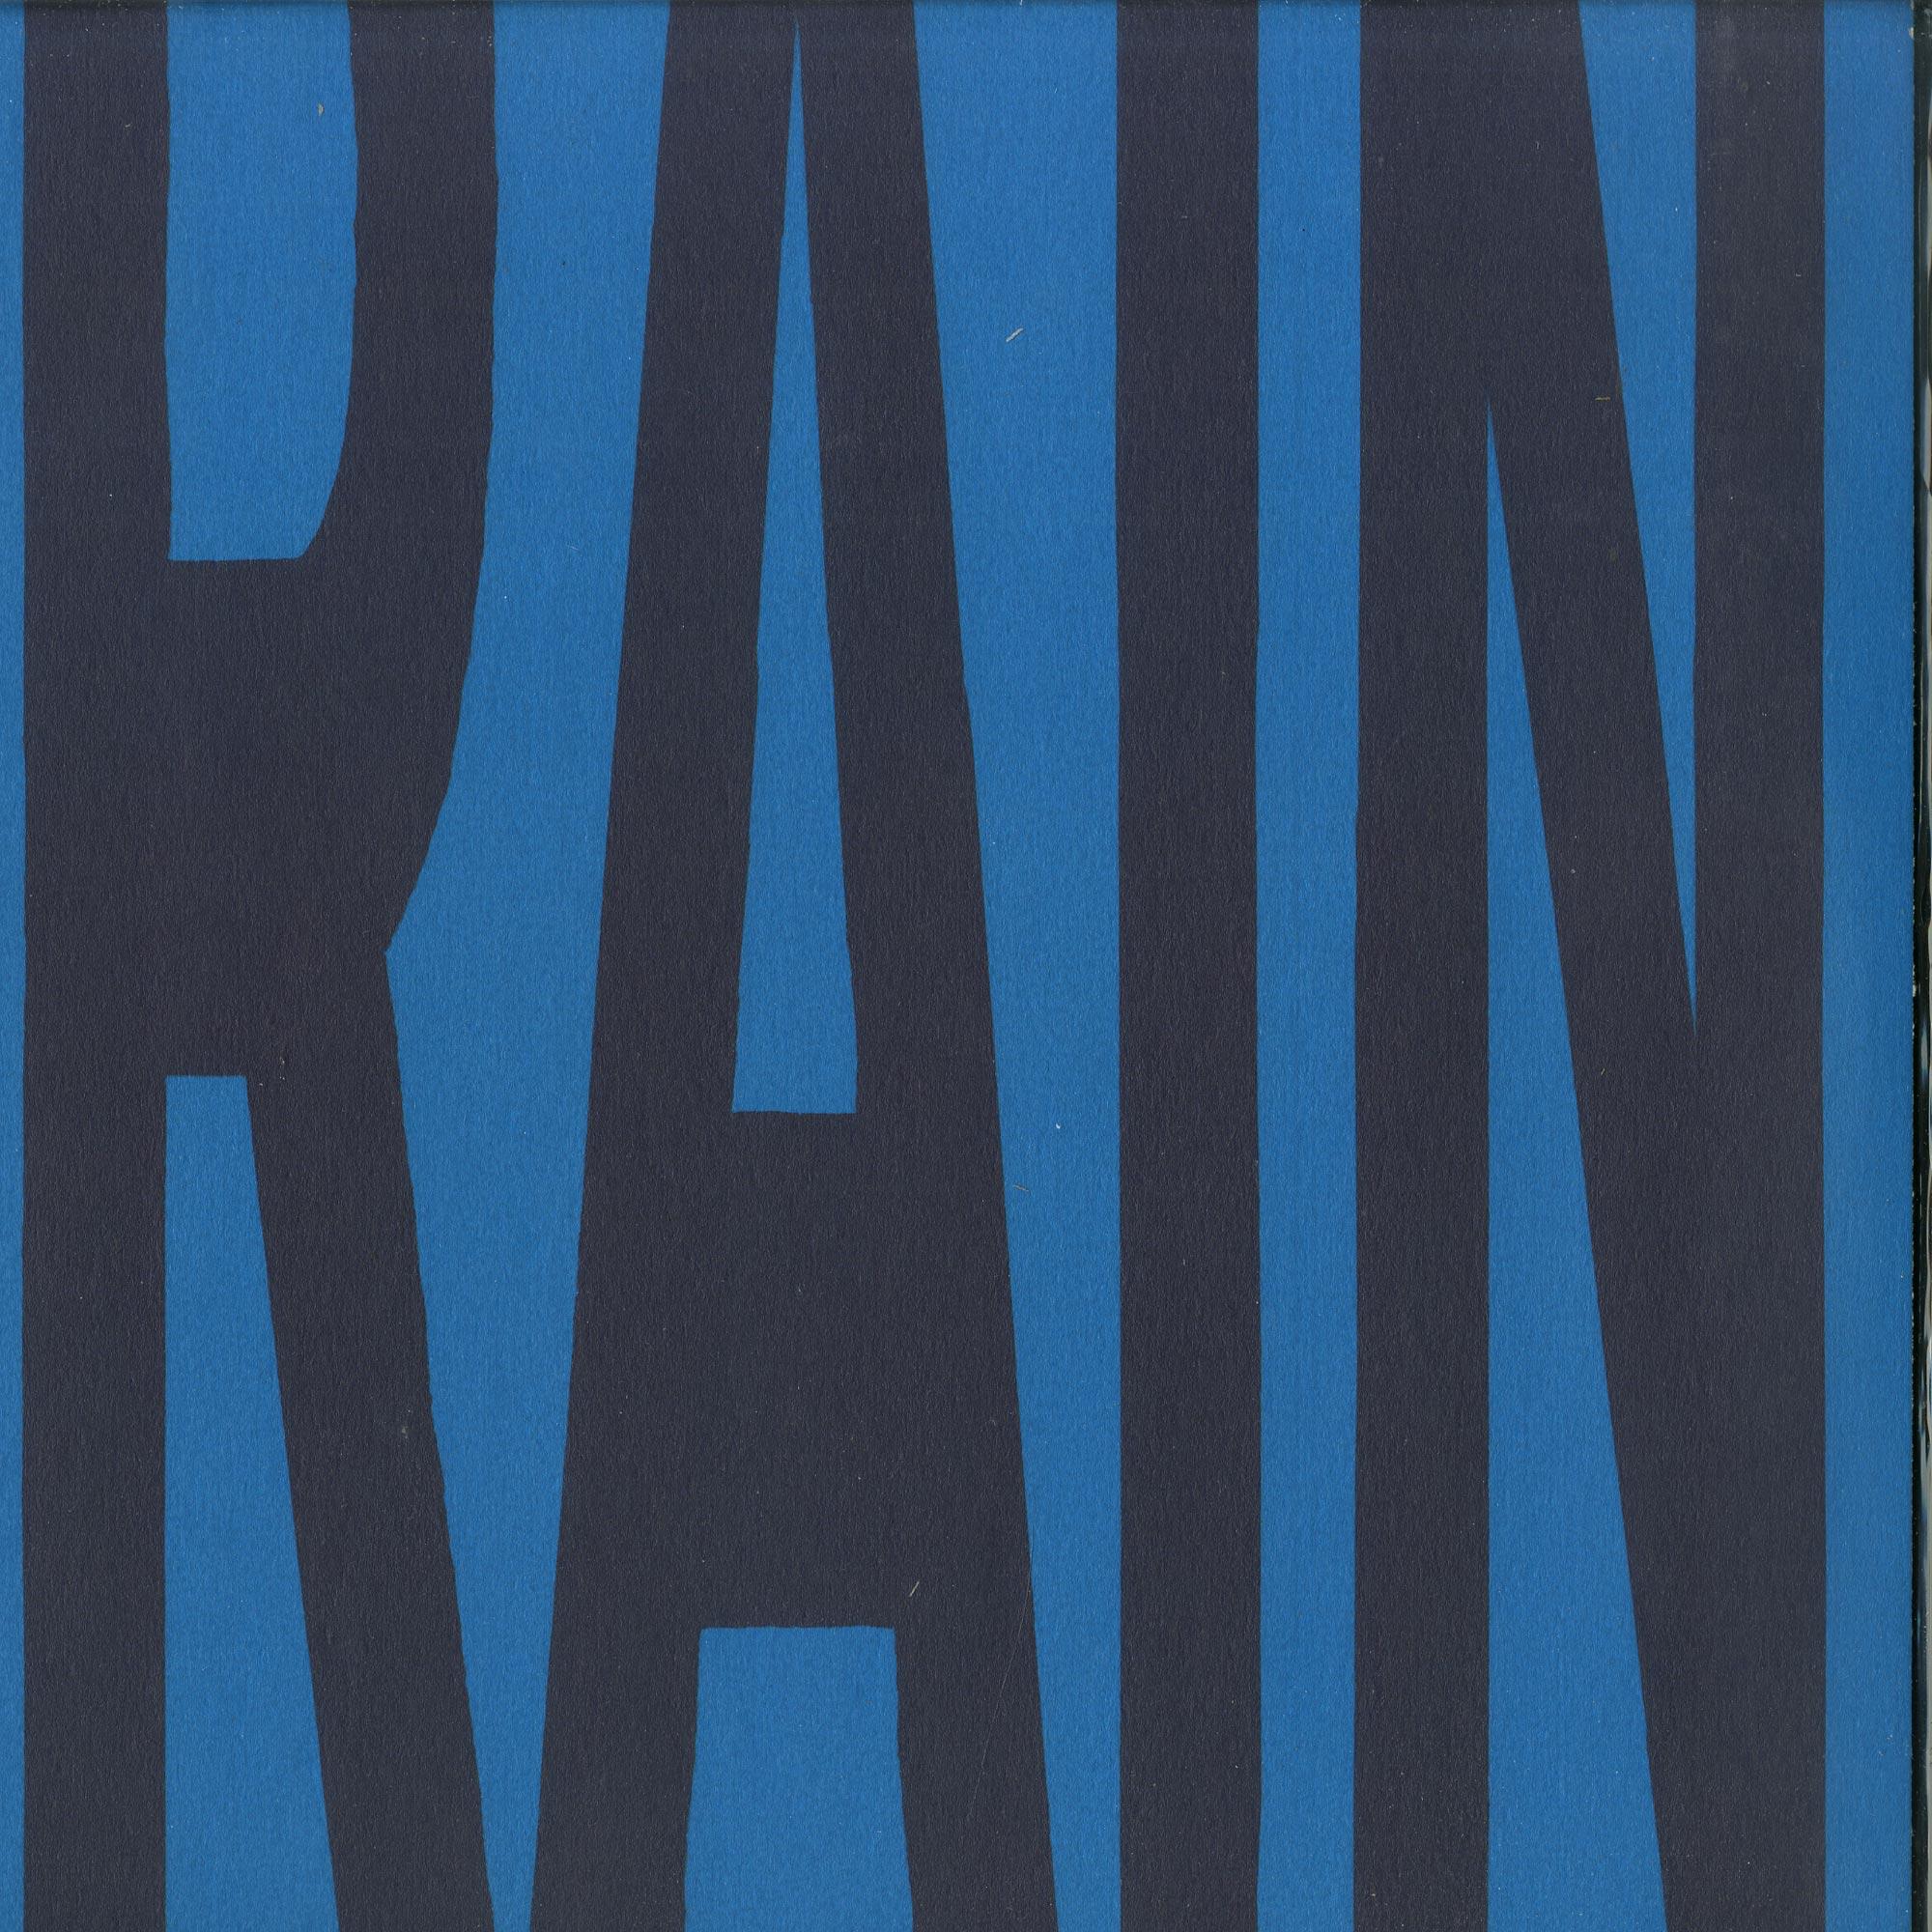 Matias Aguayo ft. Mujaji The Rain - RAIN